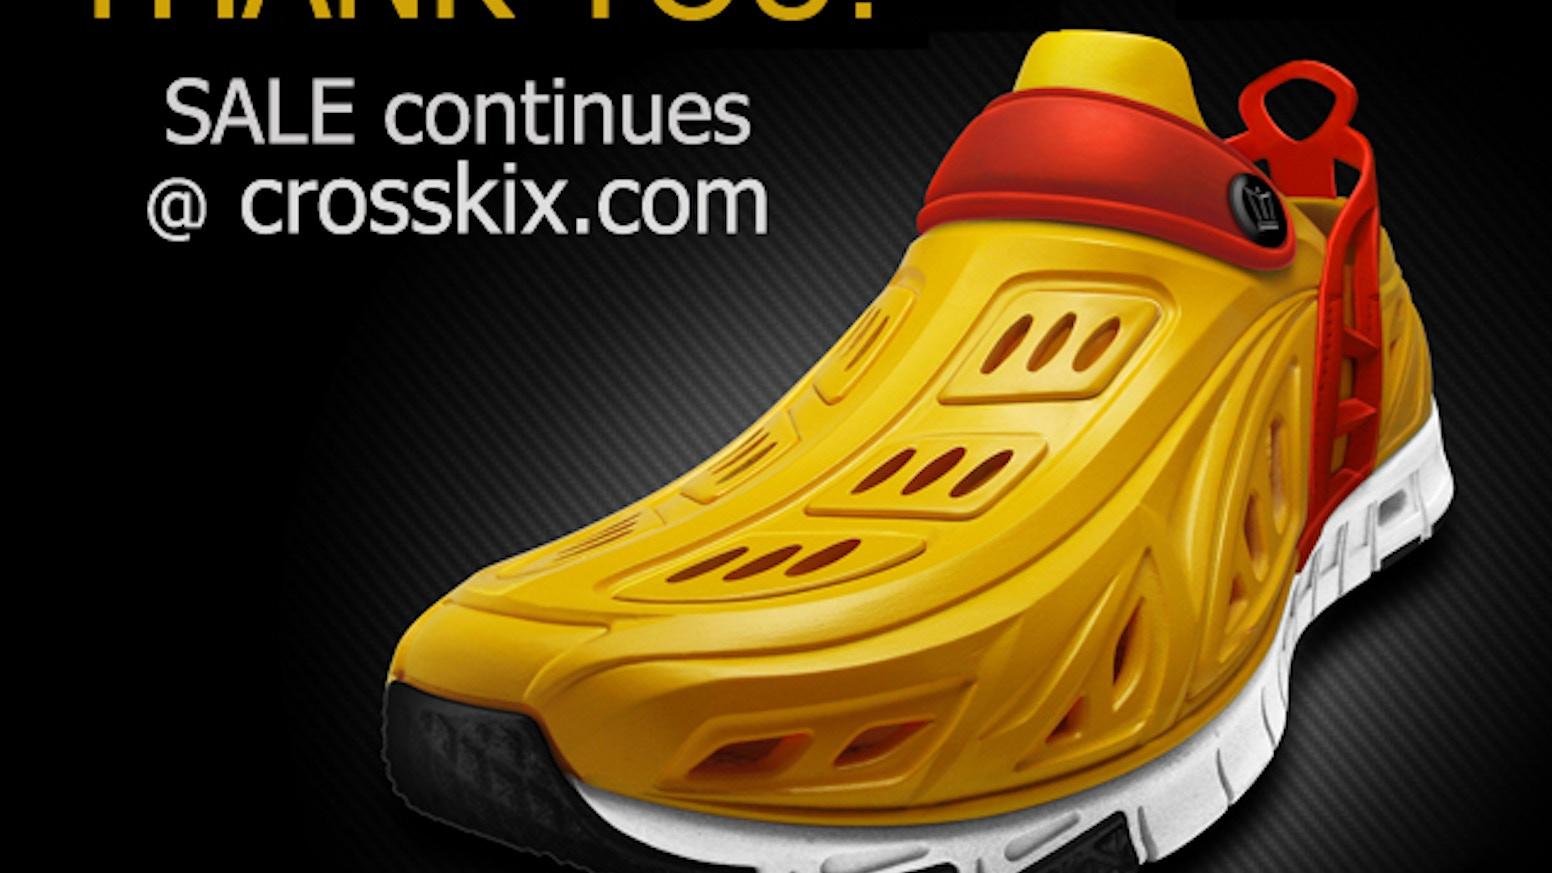 b9ba6289af7 CROSSKIX II - the